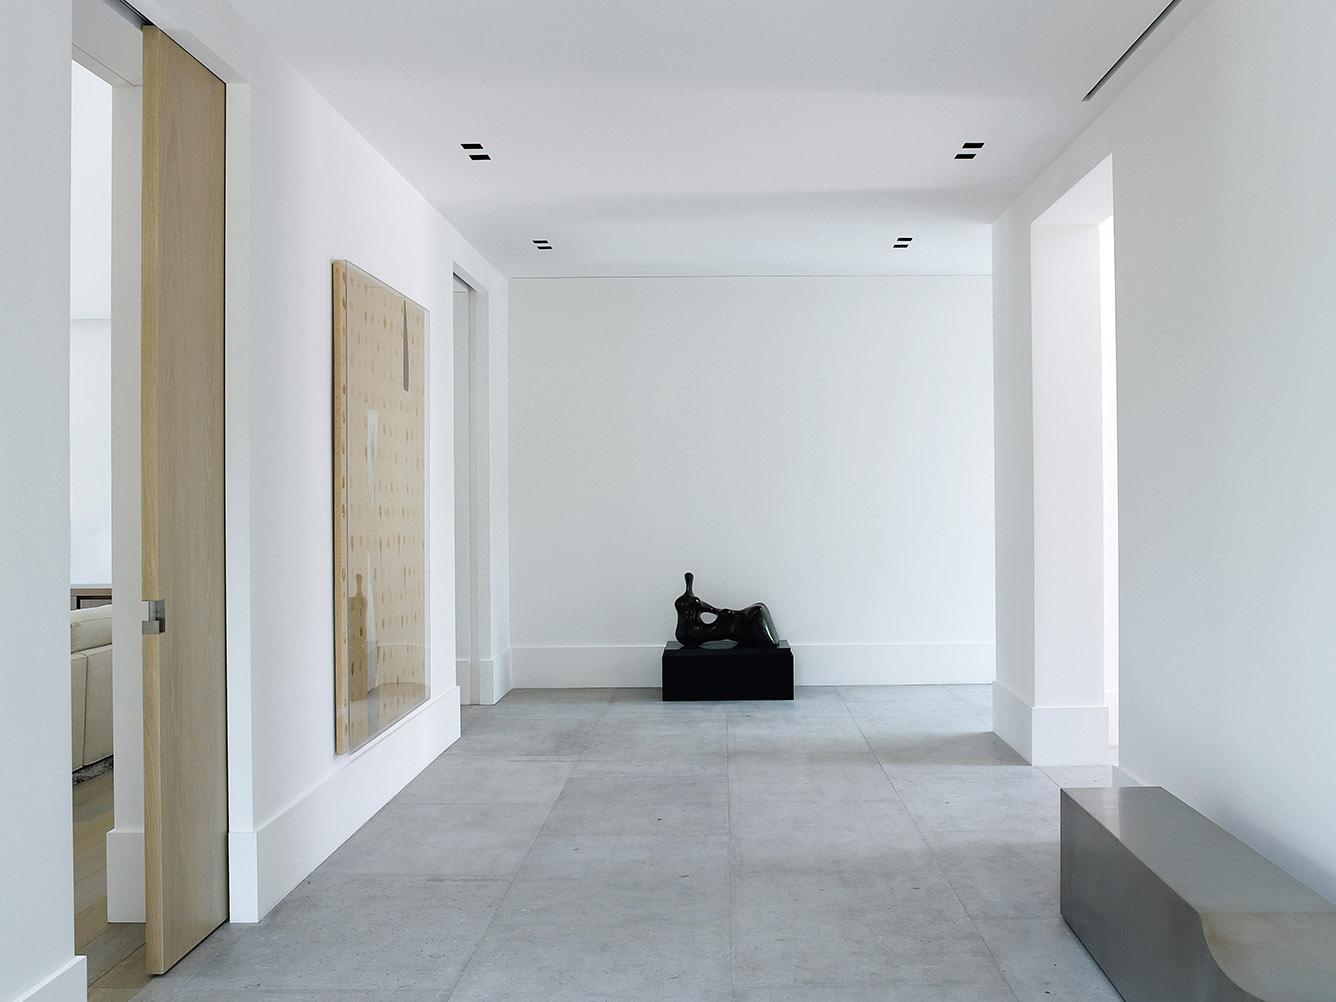 Doors by Bod'or at Korean residential resort